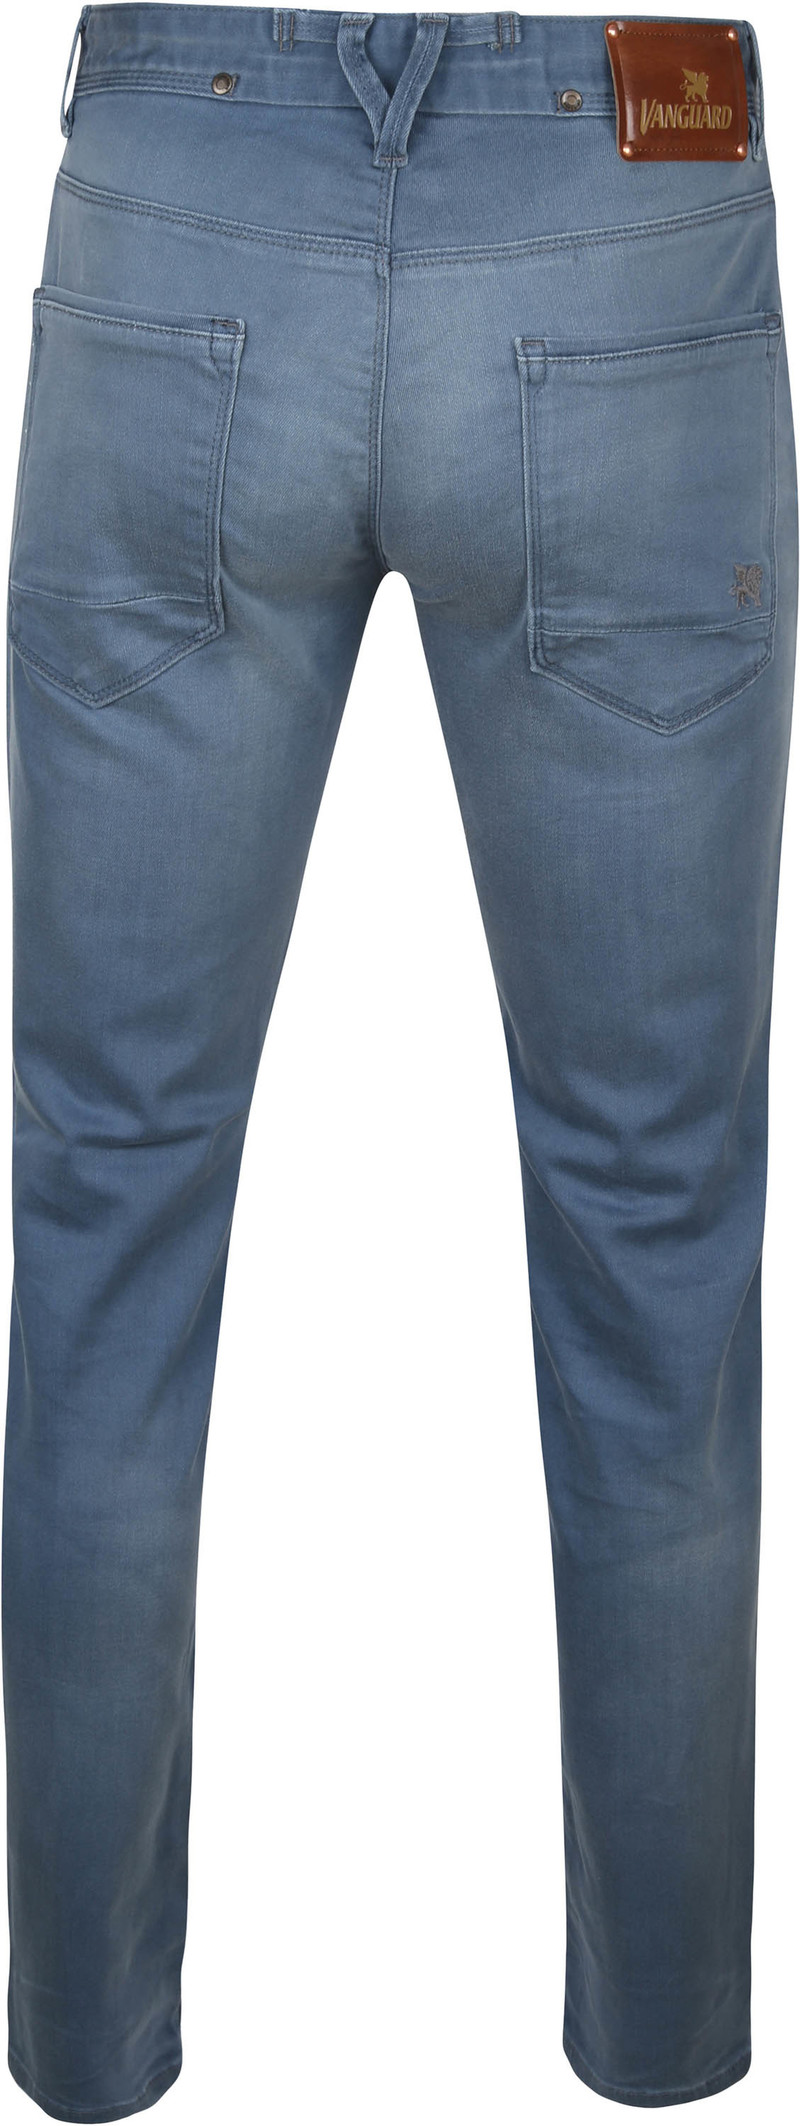 Vanguard Jeans V7 Rider Steel Blue